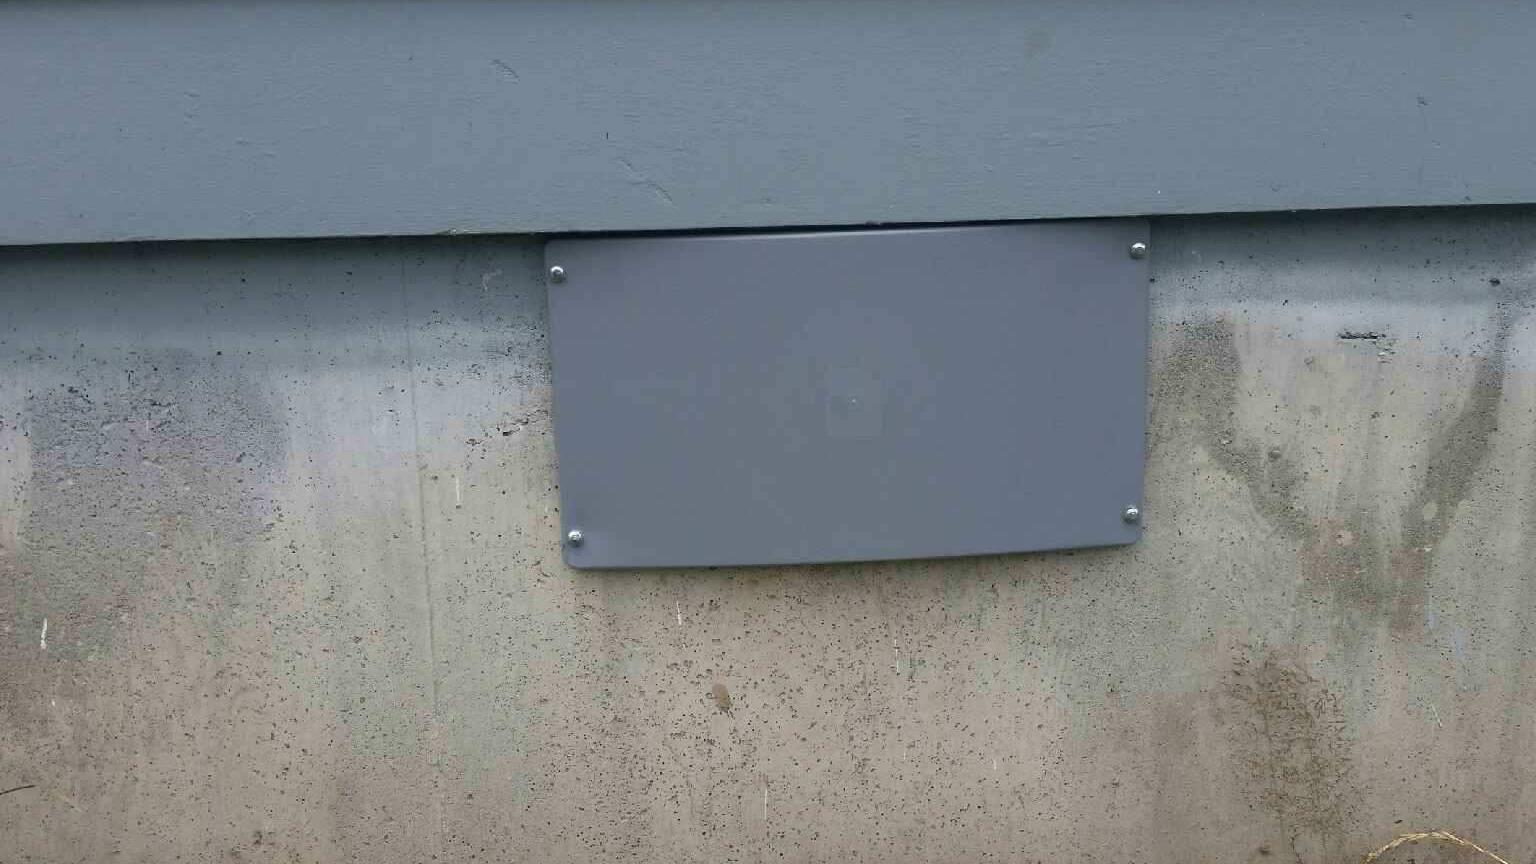 CleanSpace Northwest Crawlspace Access Everlast Door - After Photo